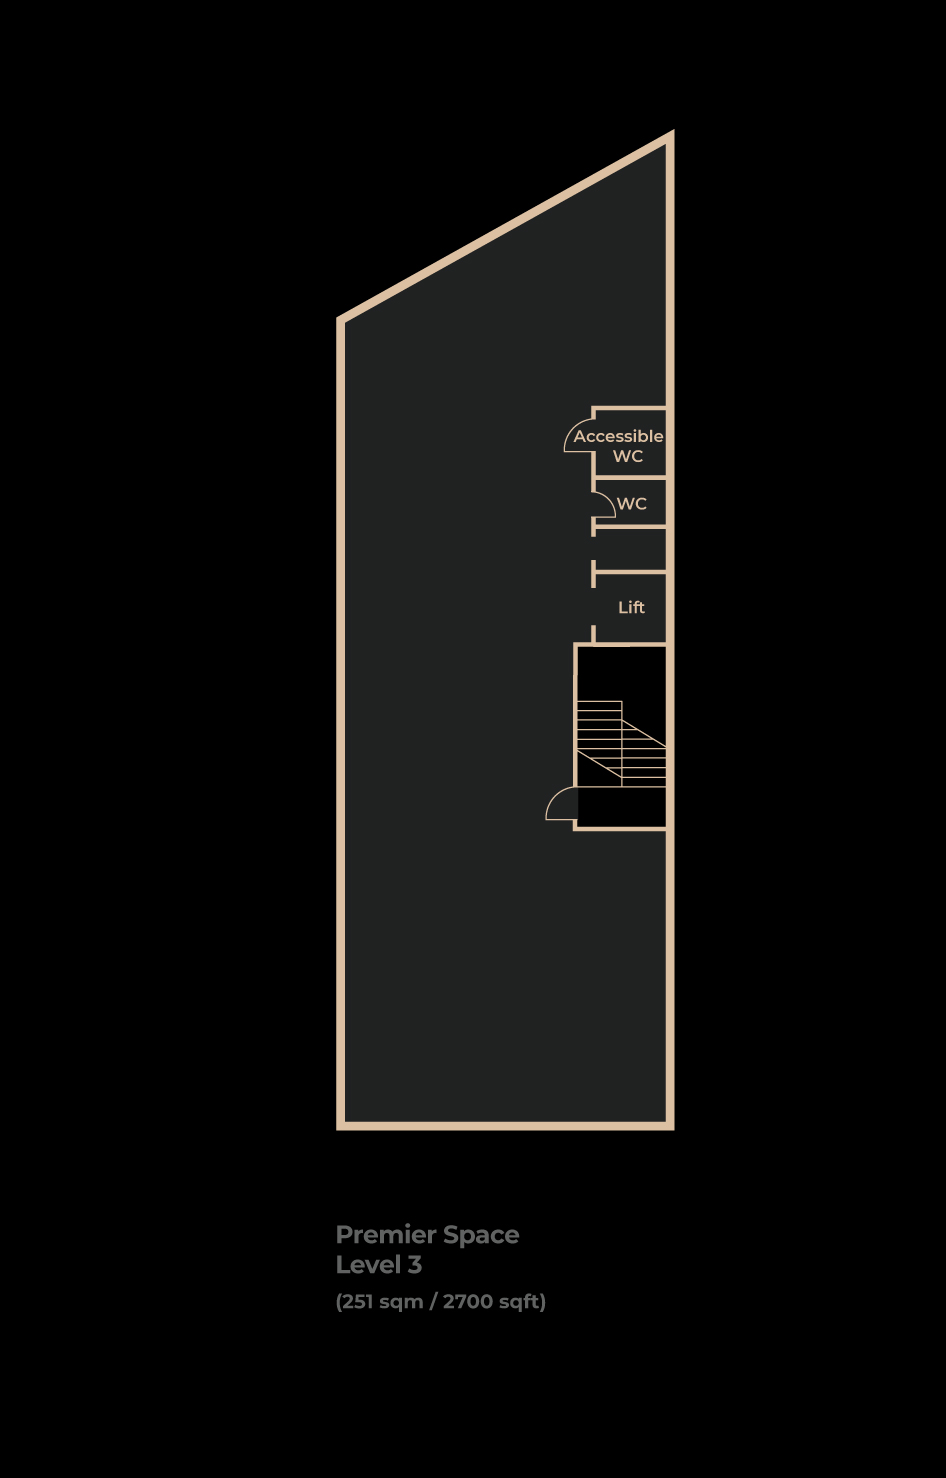 22.5.19 LTC001_Hat_House_Floorplans_StudioD_black_AW-01.jpg